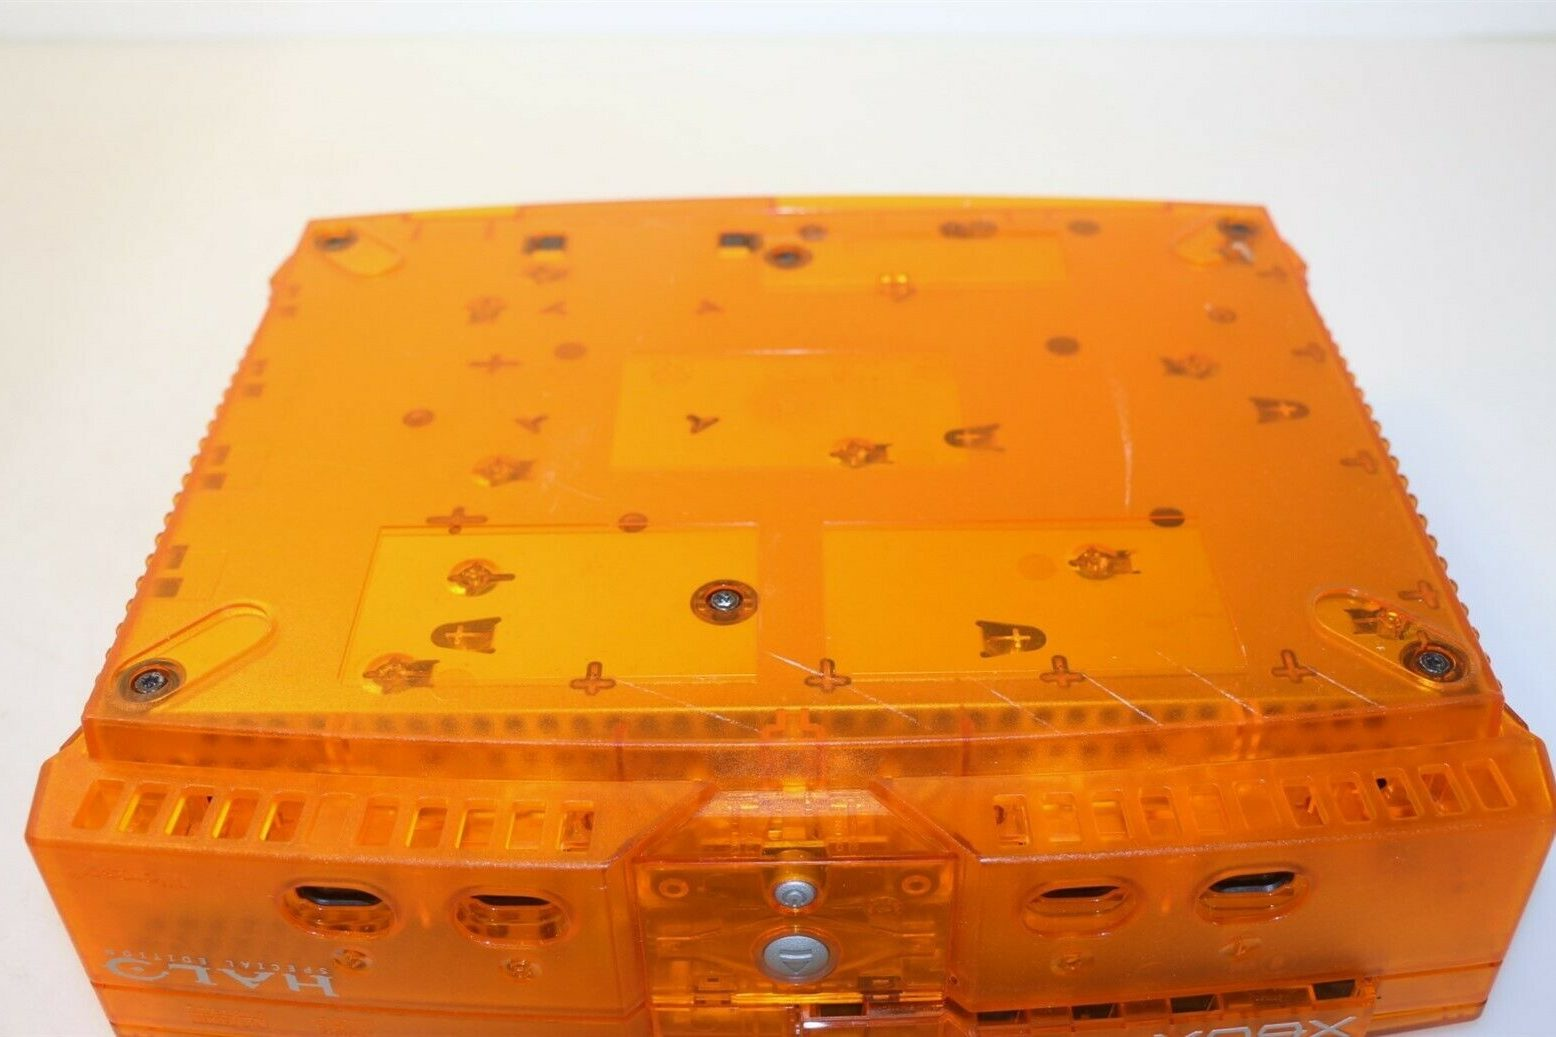 Original XBox Orange Translucent Halo Special Edition дно